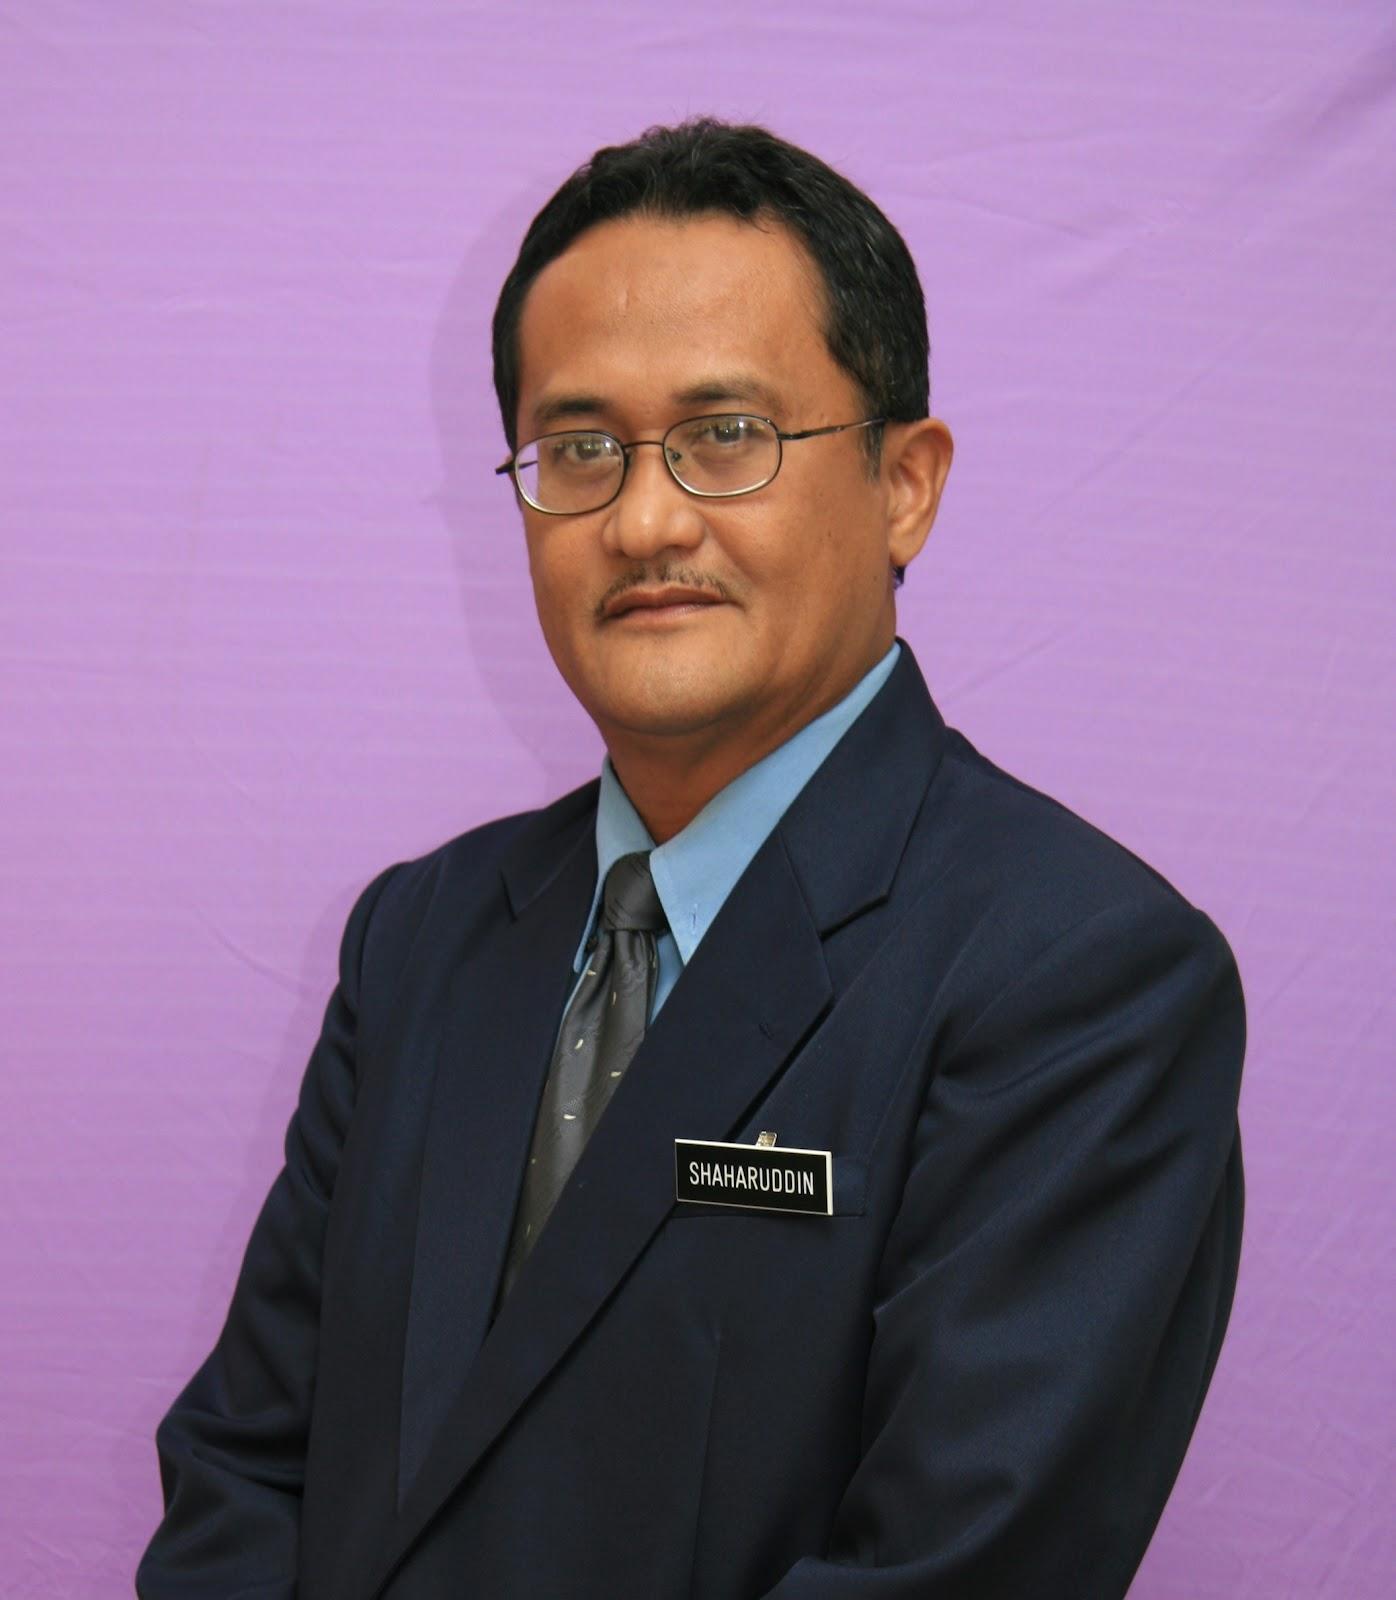 Tn. Hj. Shaharudin Othman